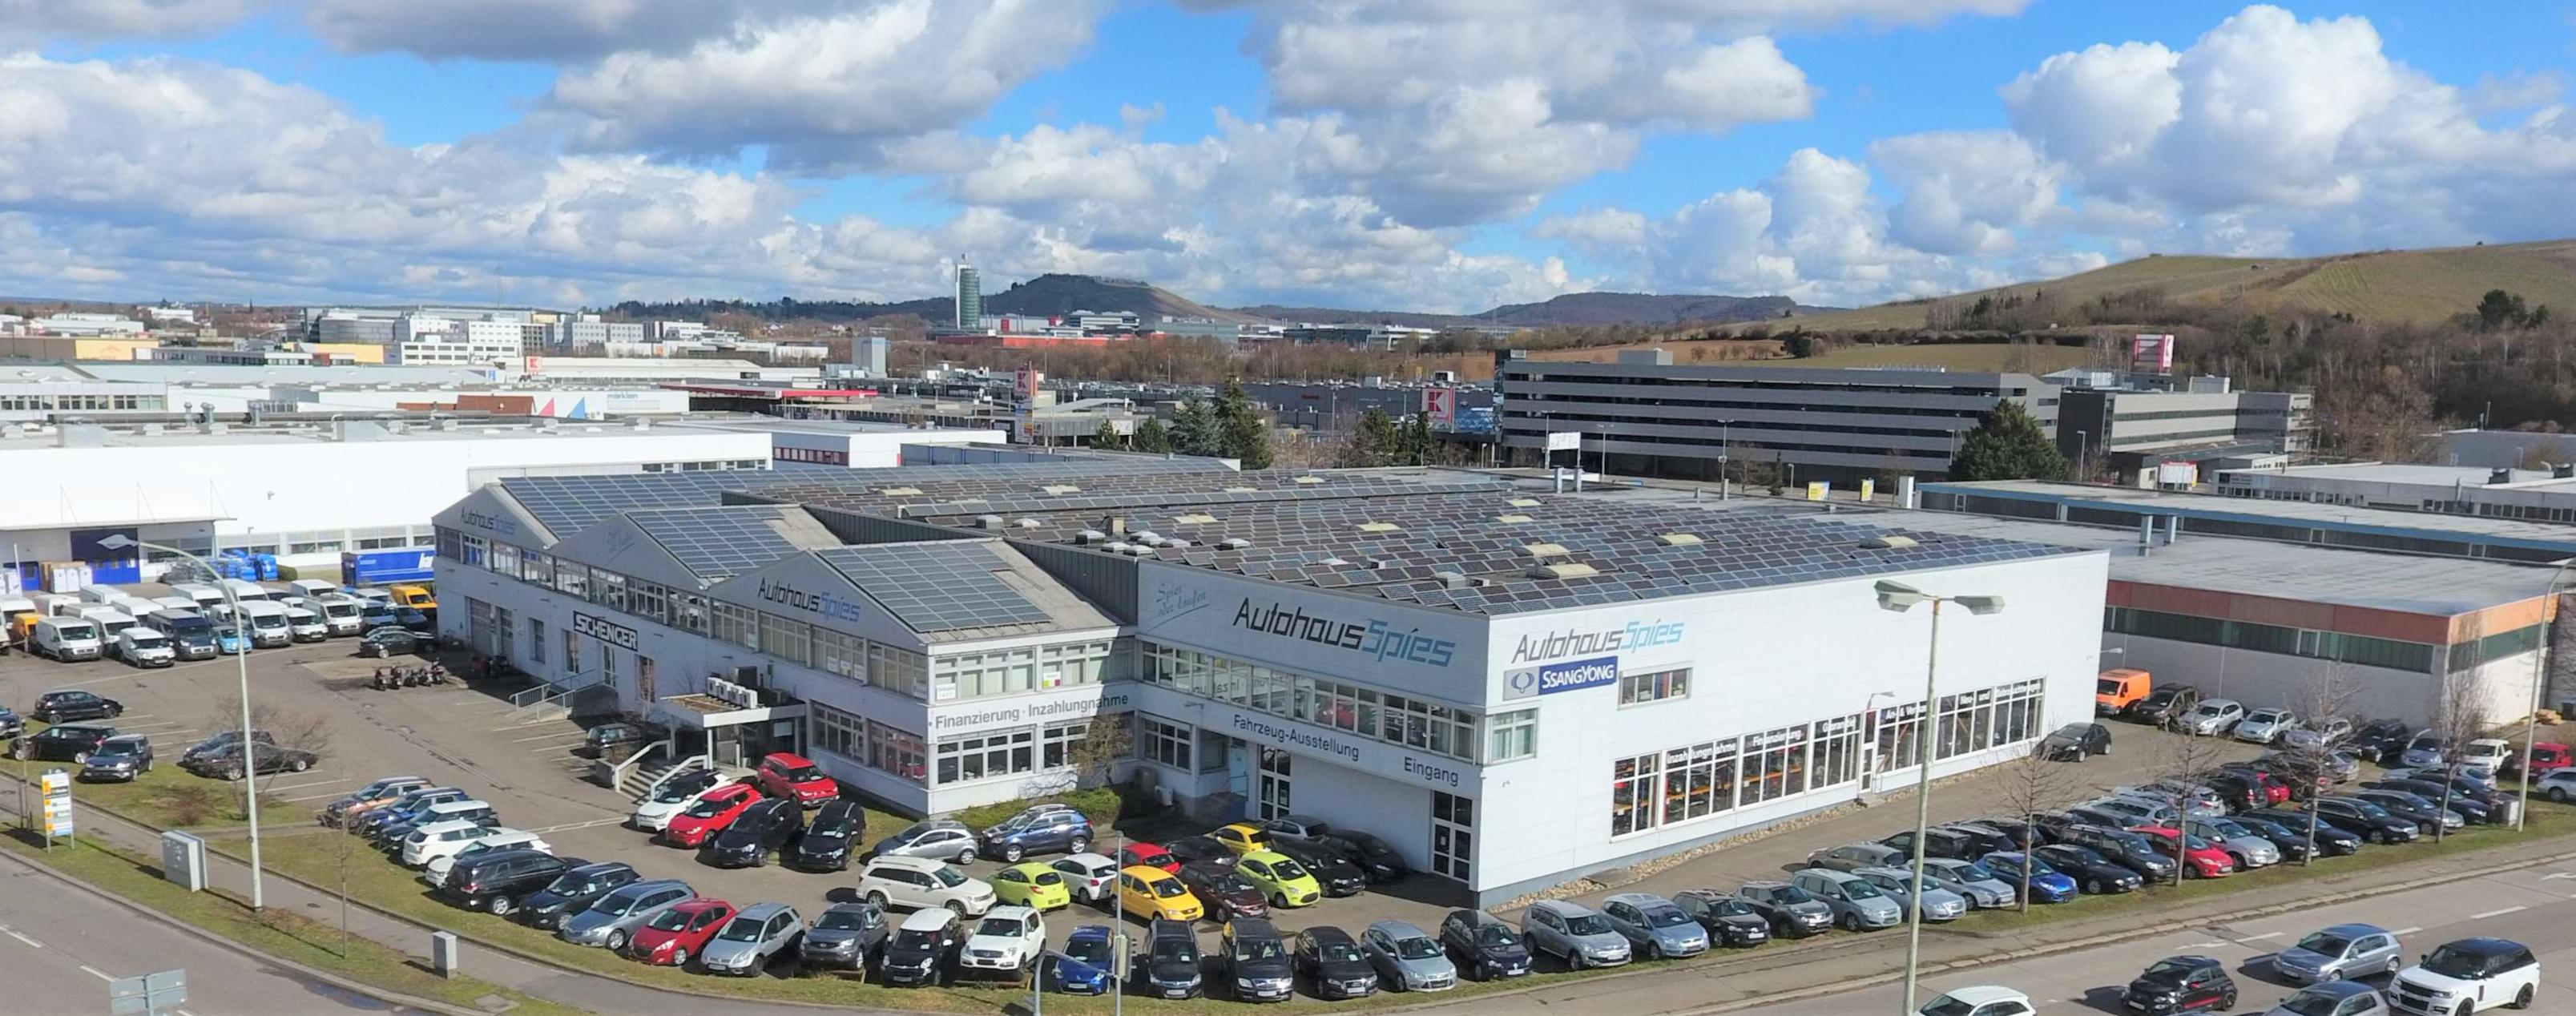 Autohaus Spiess